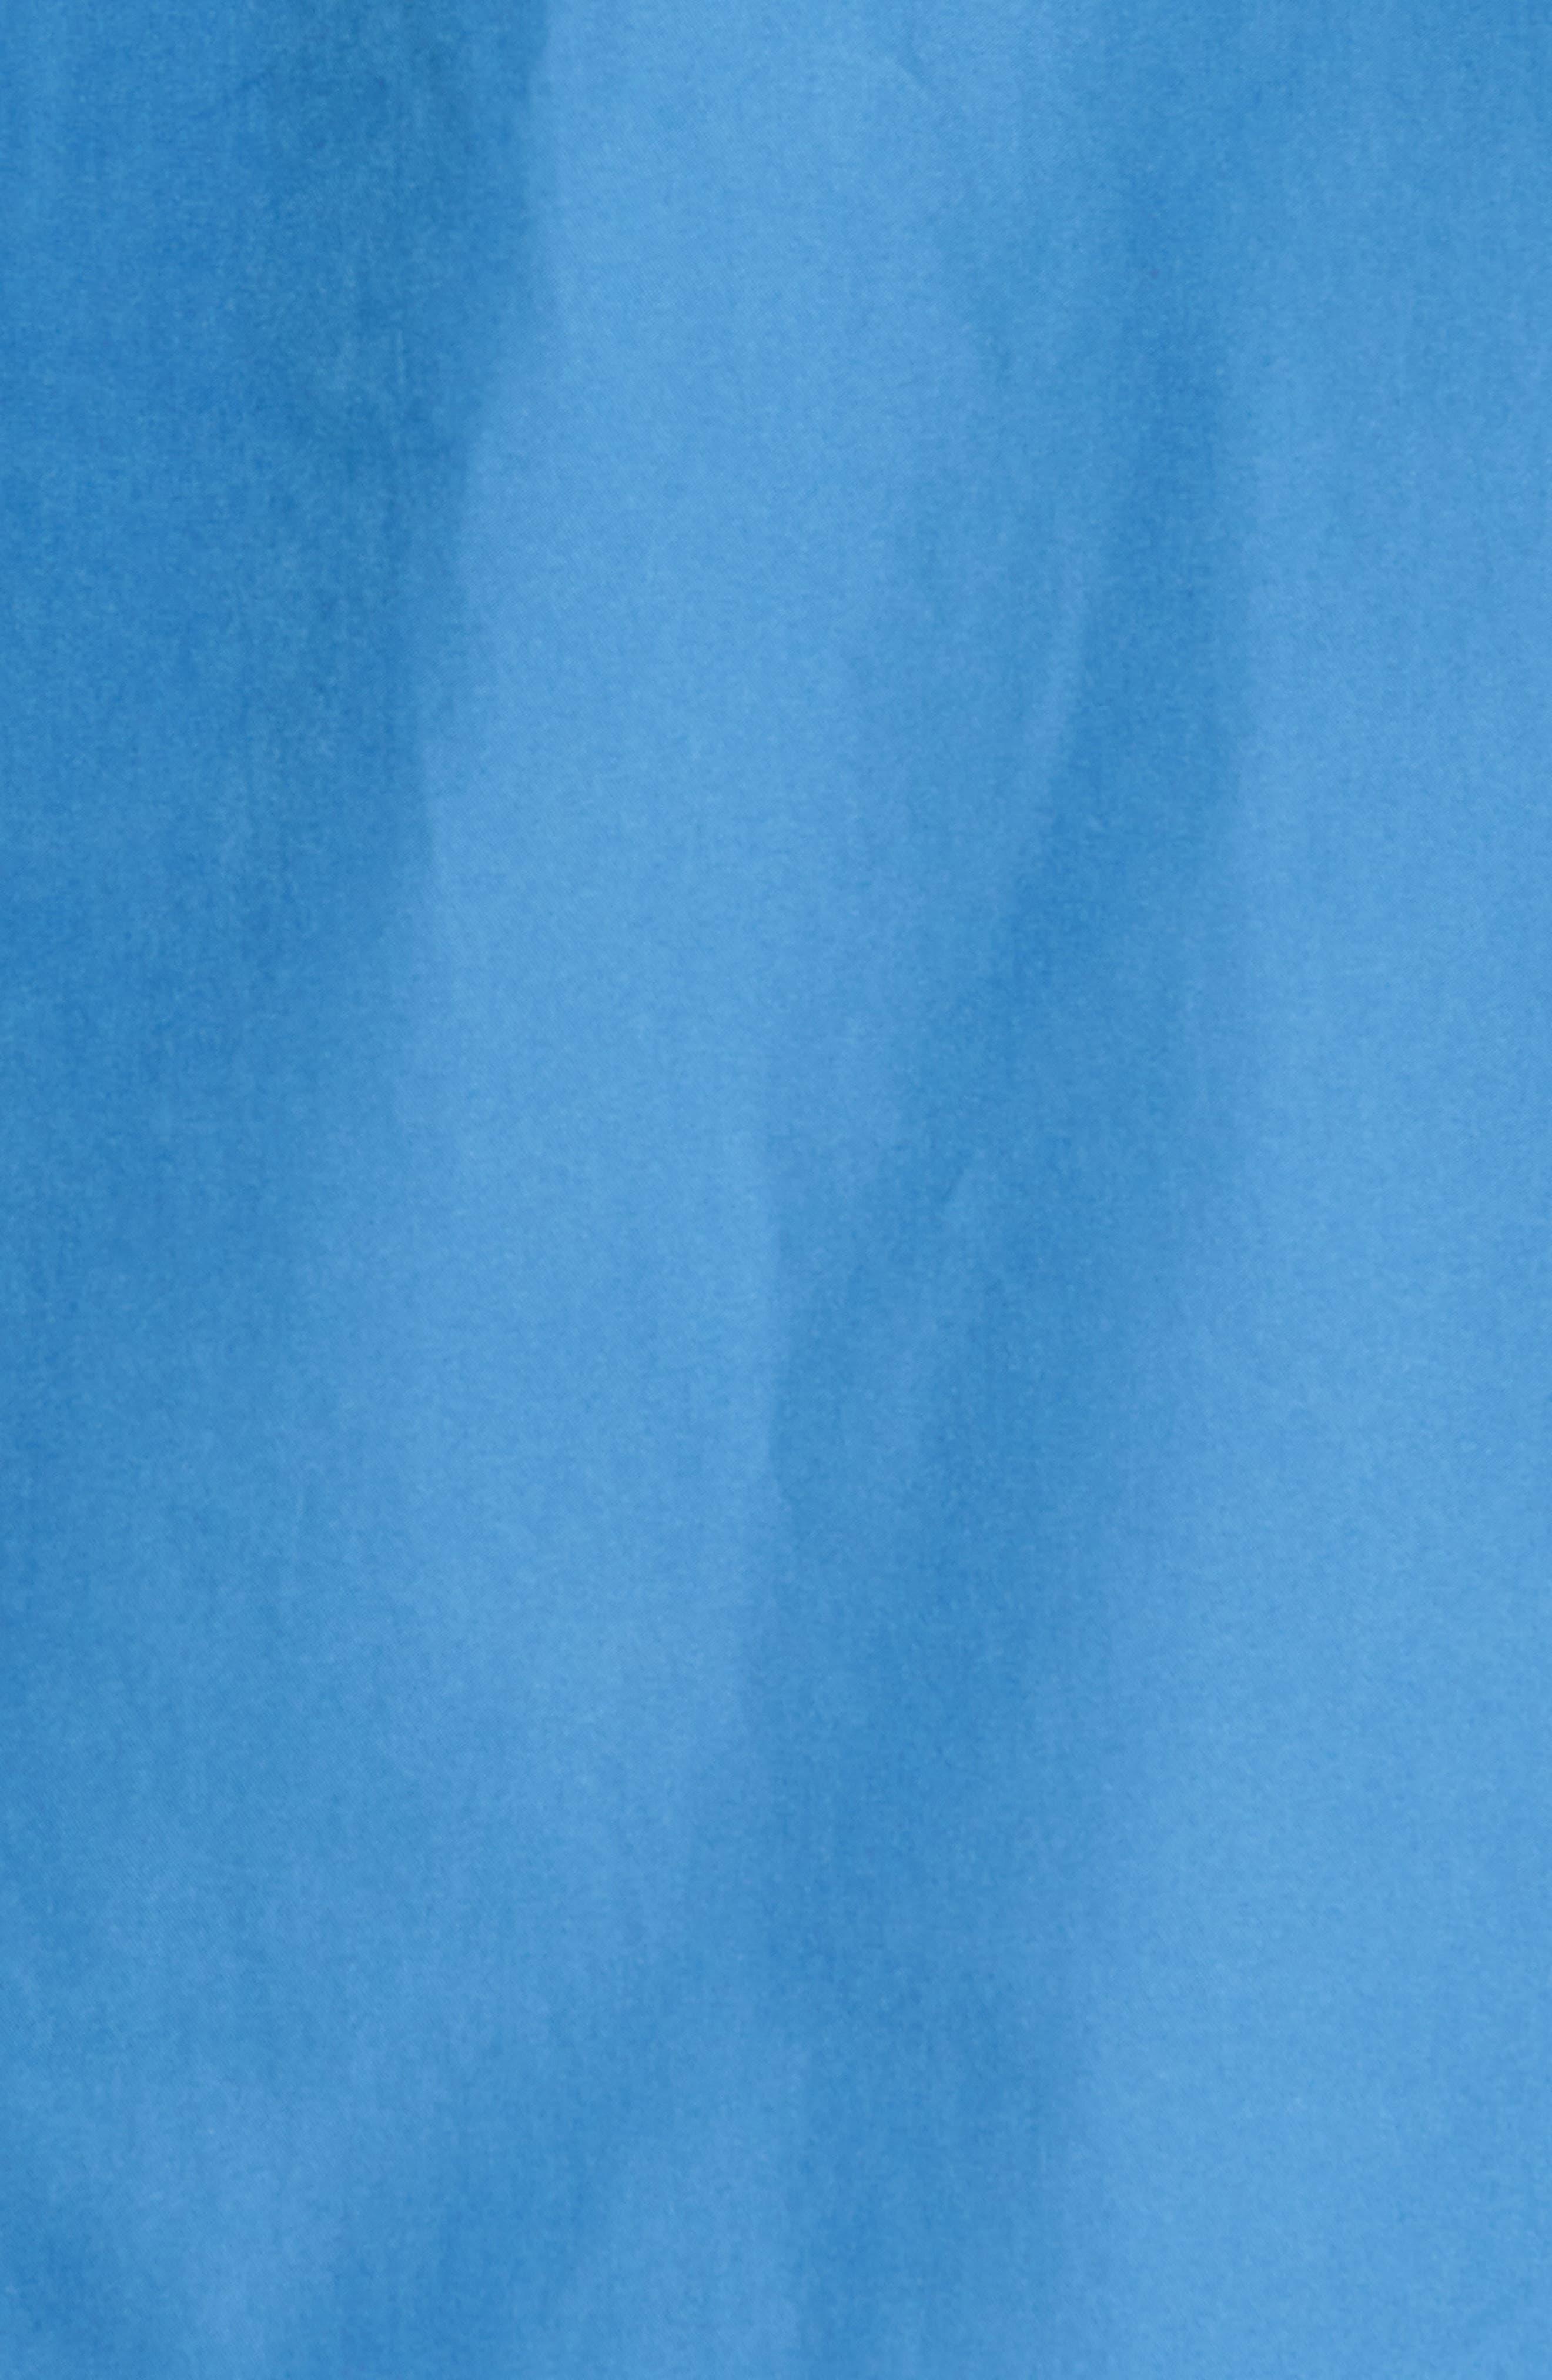 Paul&Shark Water Repellent Microfiber Jacket,                             Alternate thumbnail 6, color,                             405